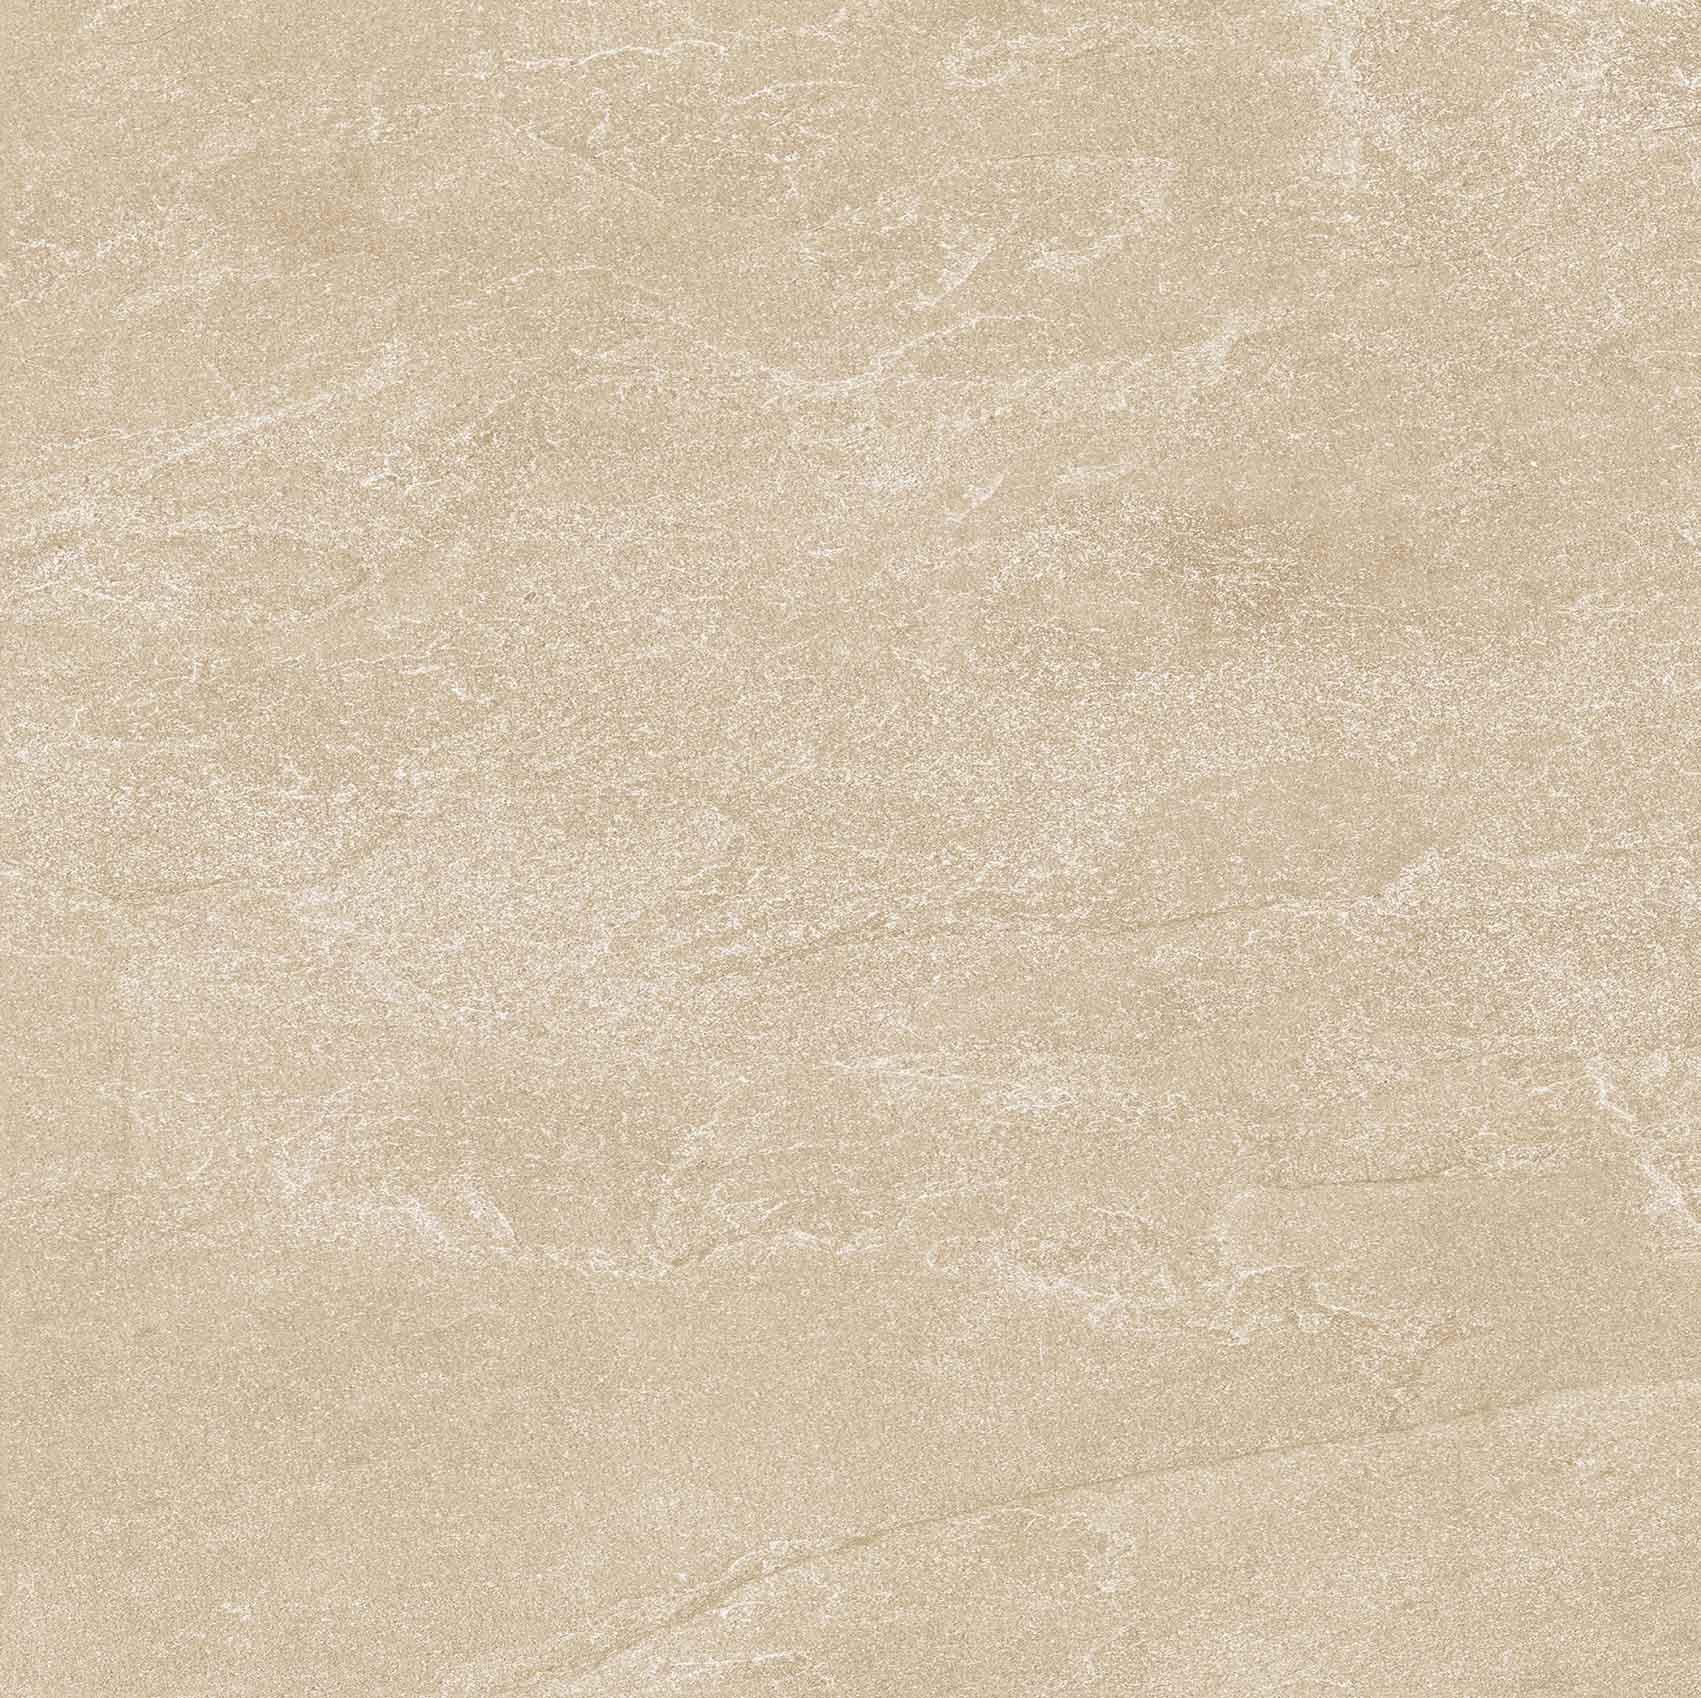 Natural Stone Cream Matte 10mm 60 x 60